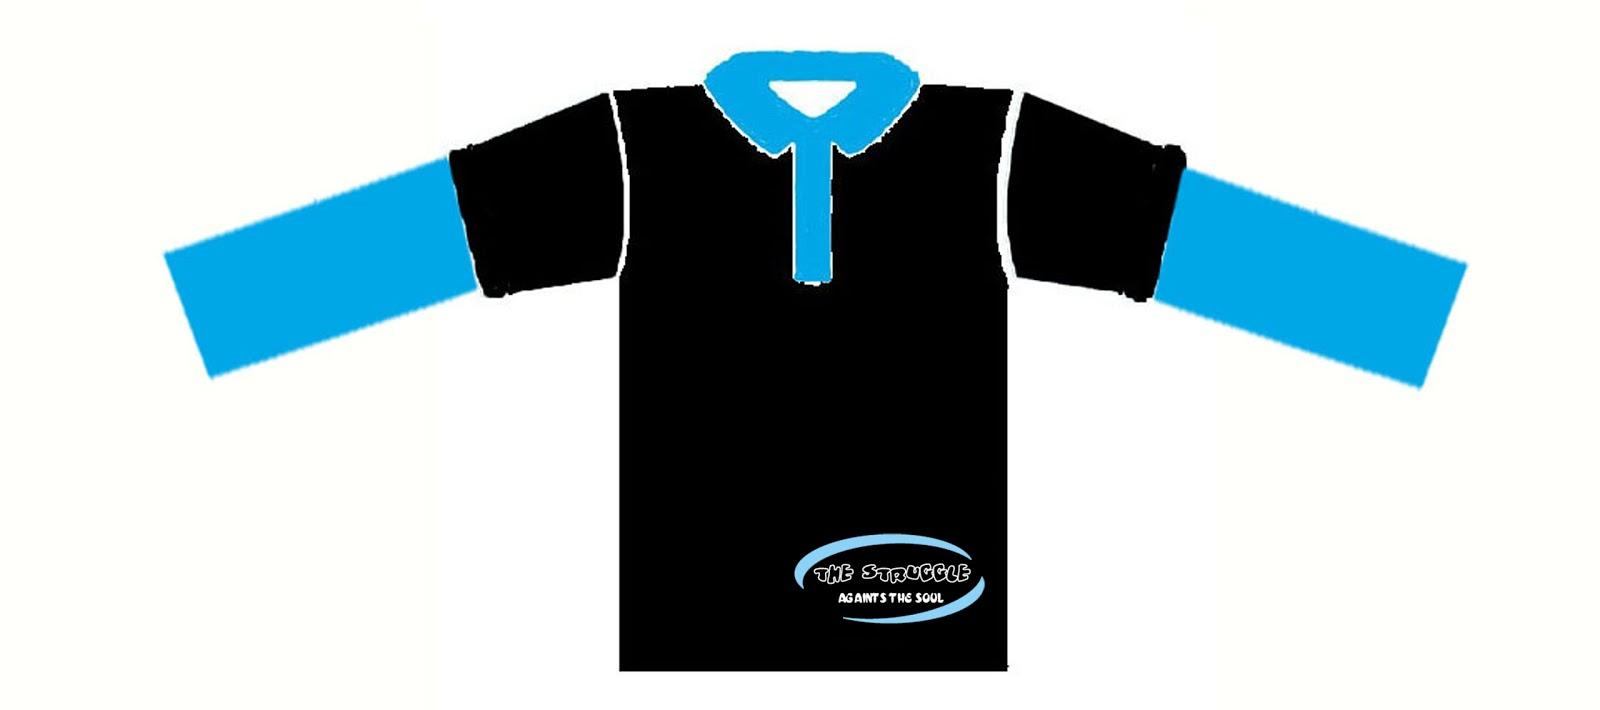 Design baju t shirt kelas - Kelas Al Razi Front 1